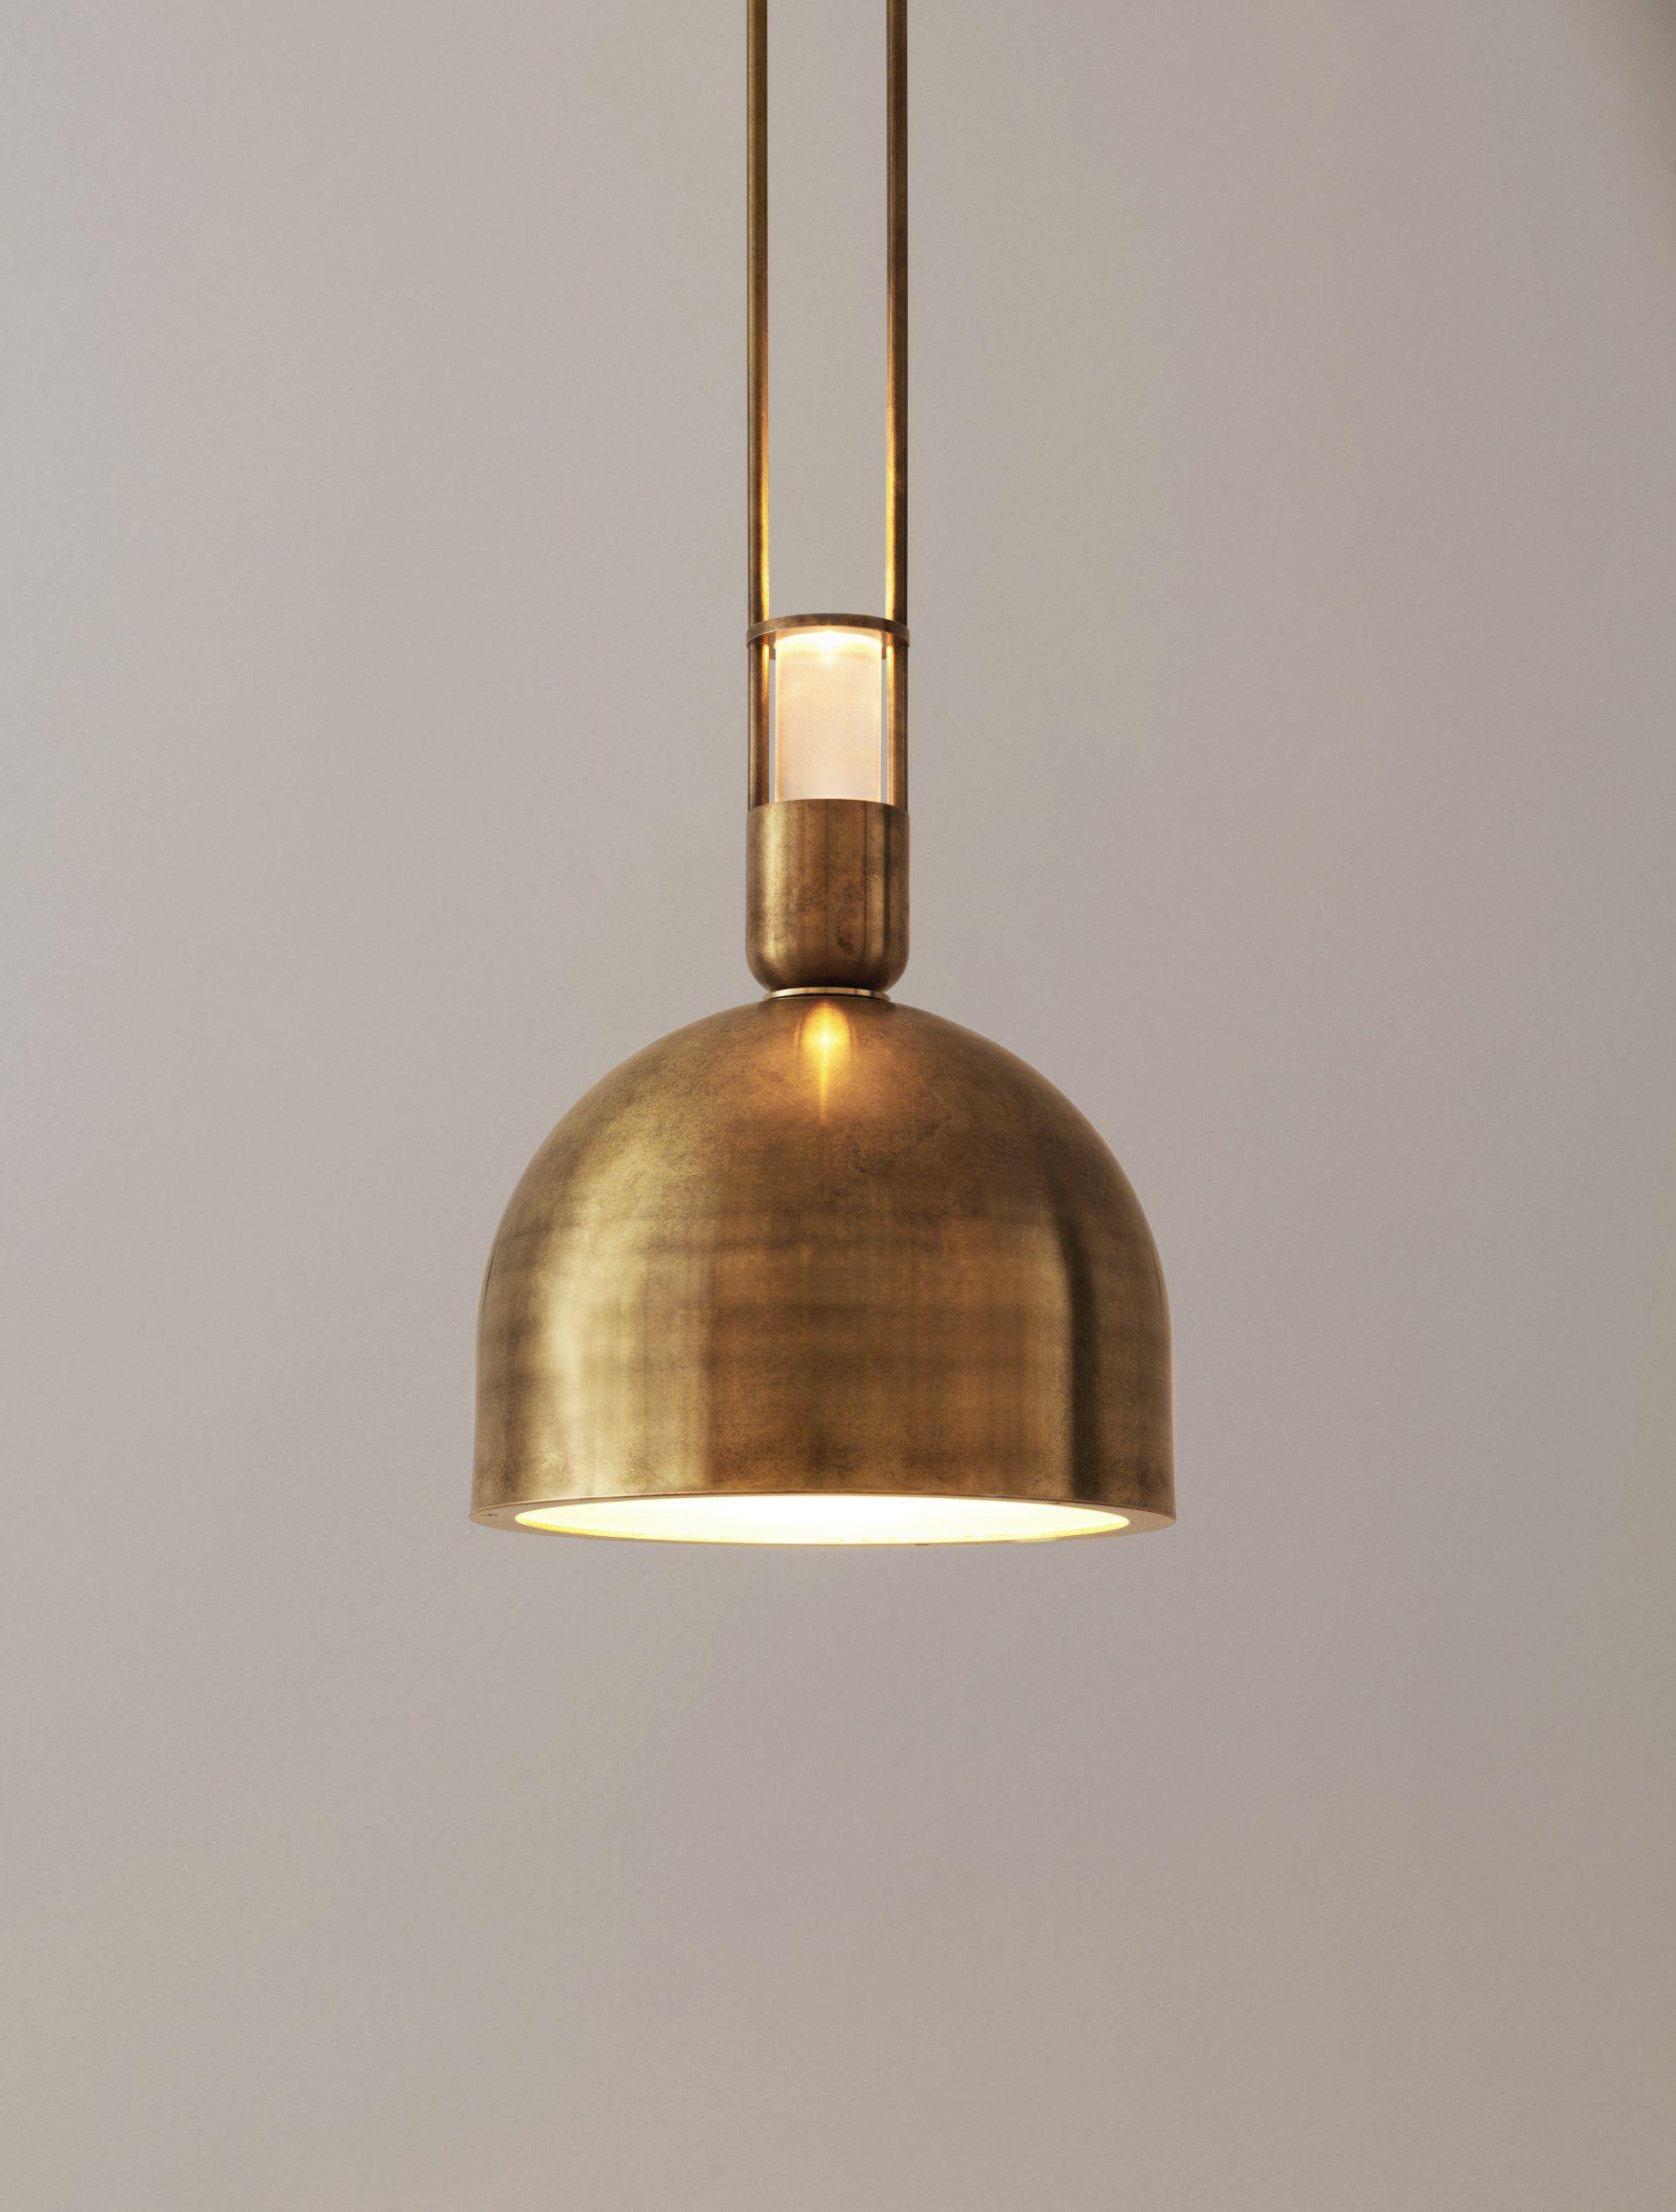 Aria 12 Pendant In 2021 Modern Brass Lighting Modern Hanging Lights Mid Century Modern Lighting Pendant